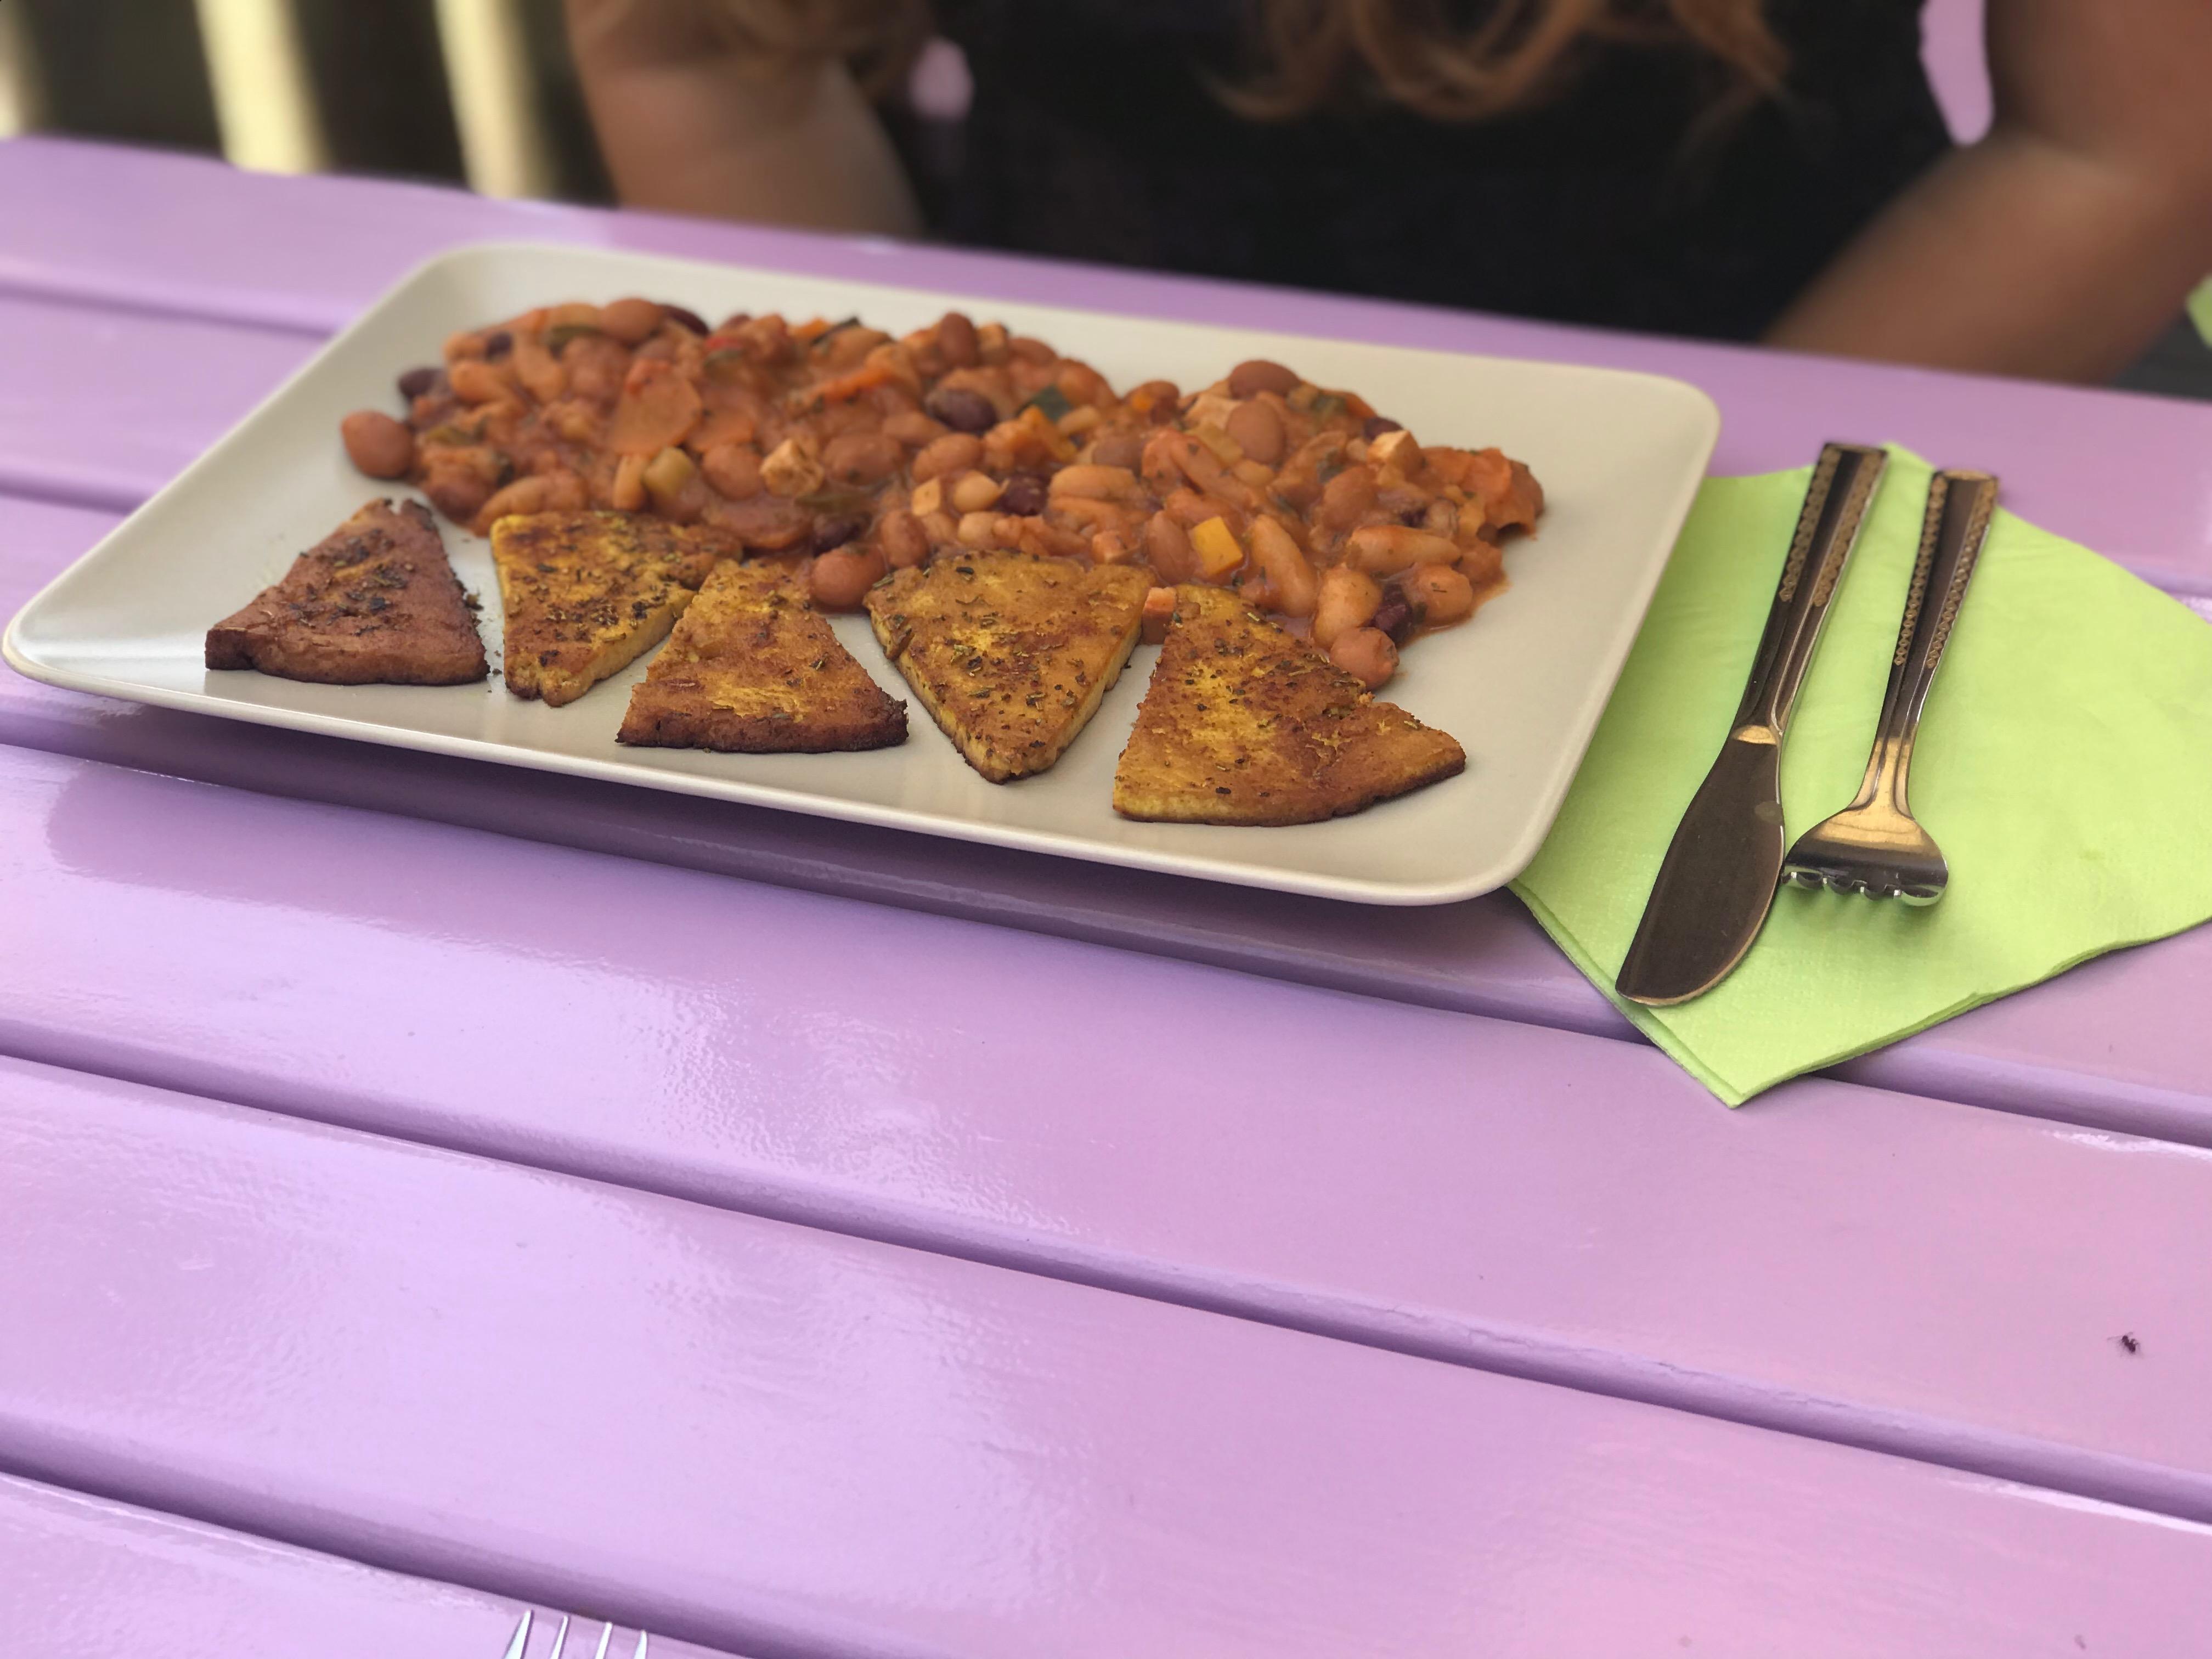 Legumes and tofu